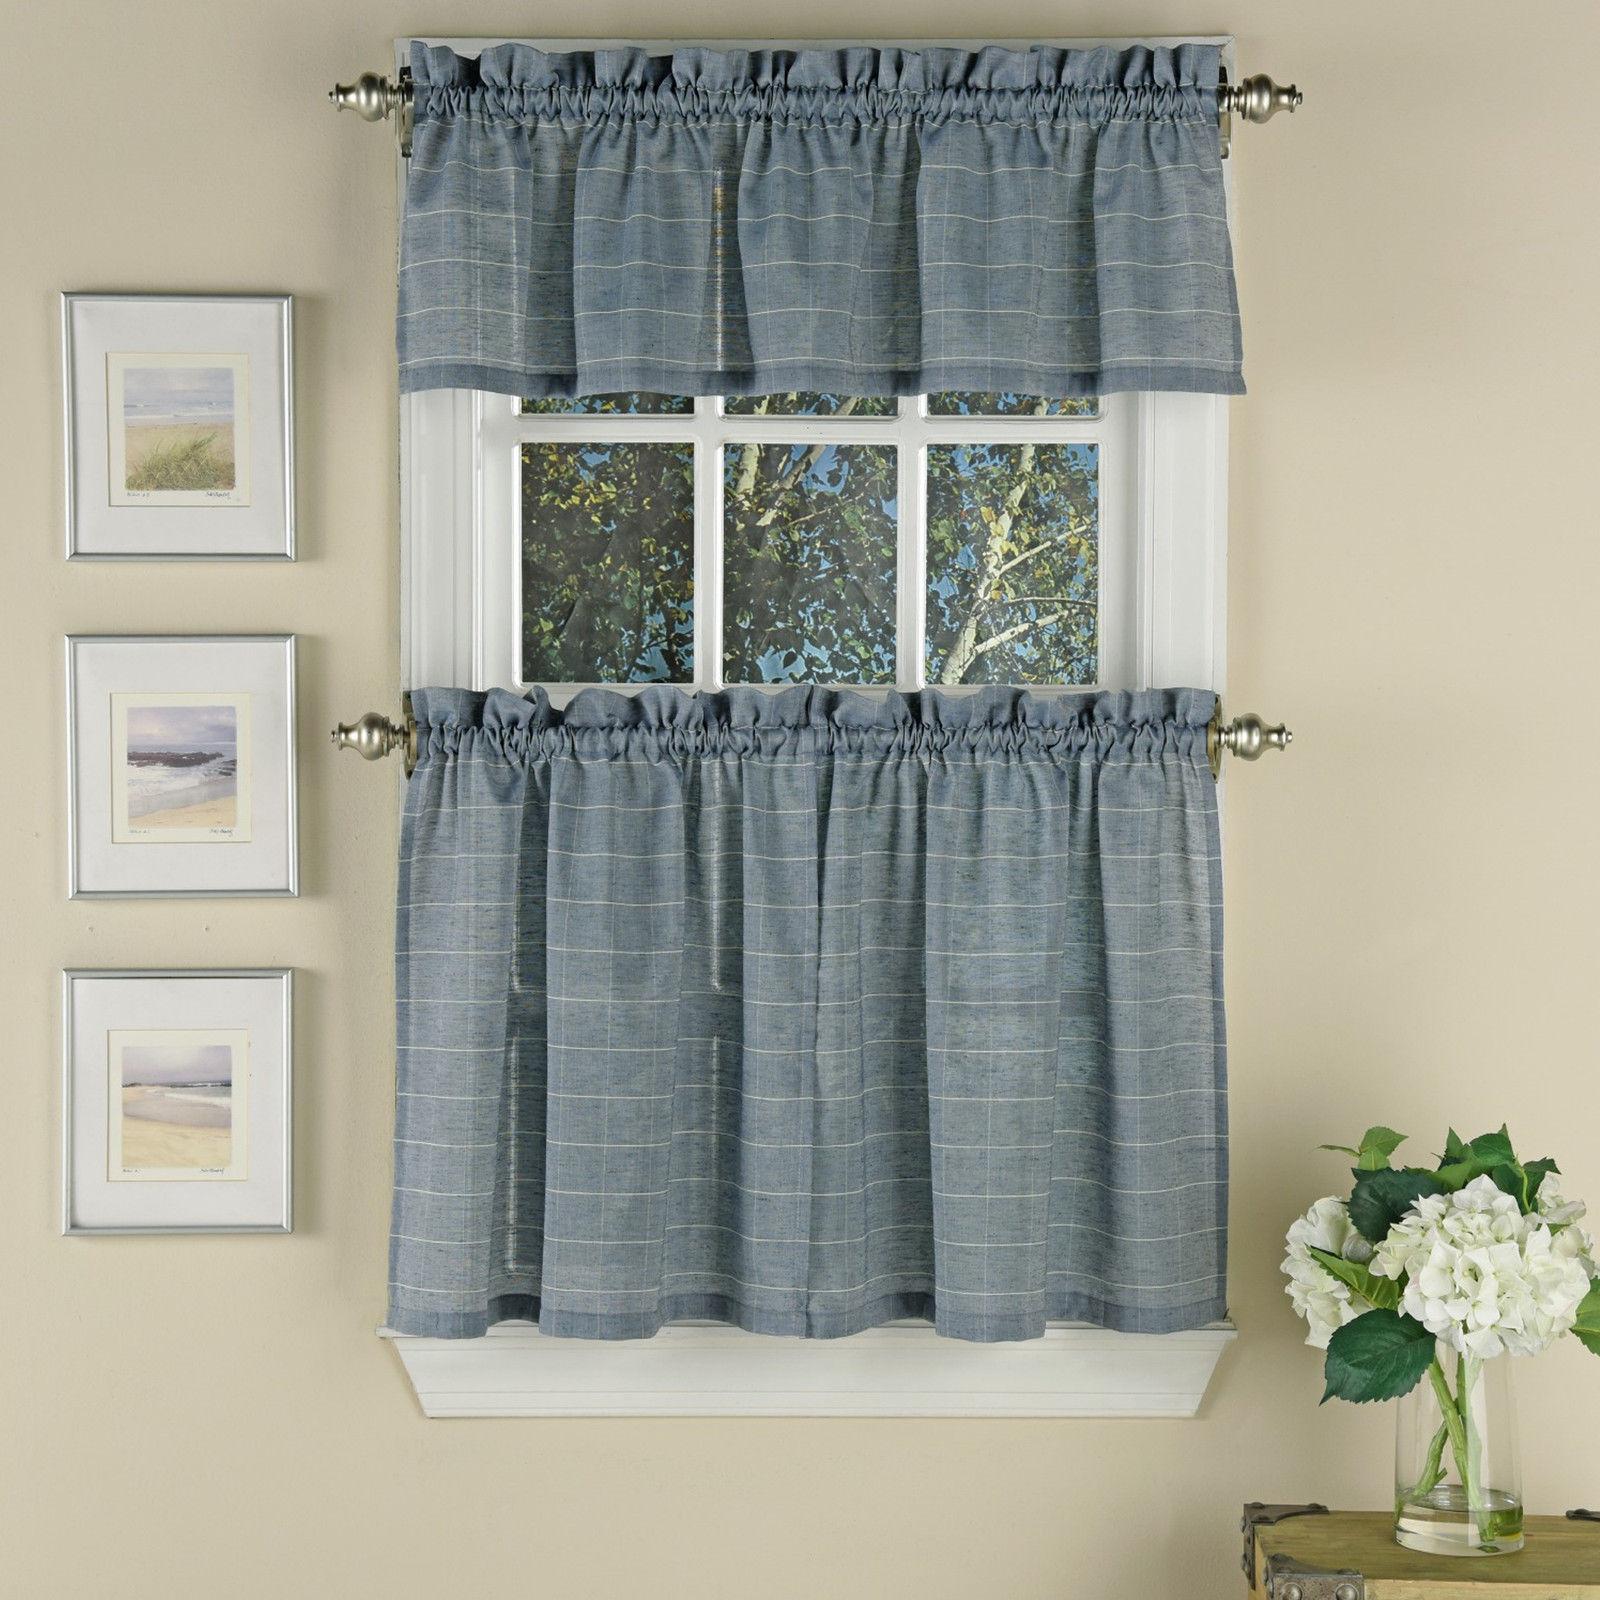 Vue Supple Woven Window Pane Pattern Kitchen Curtain Tiers or Valance Blue - $21.09